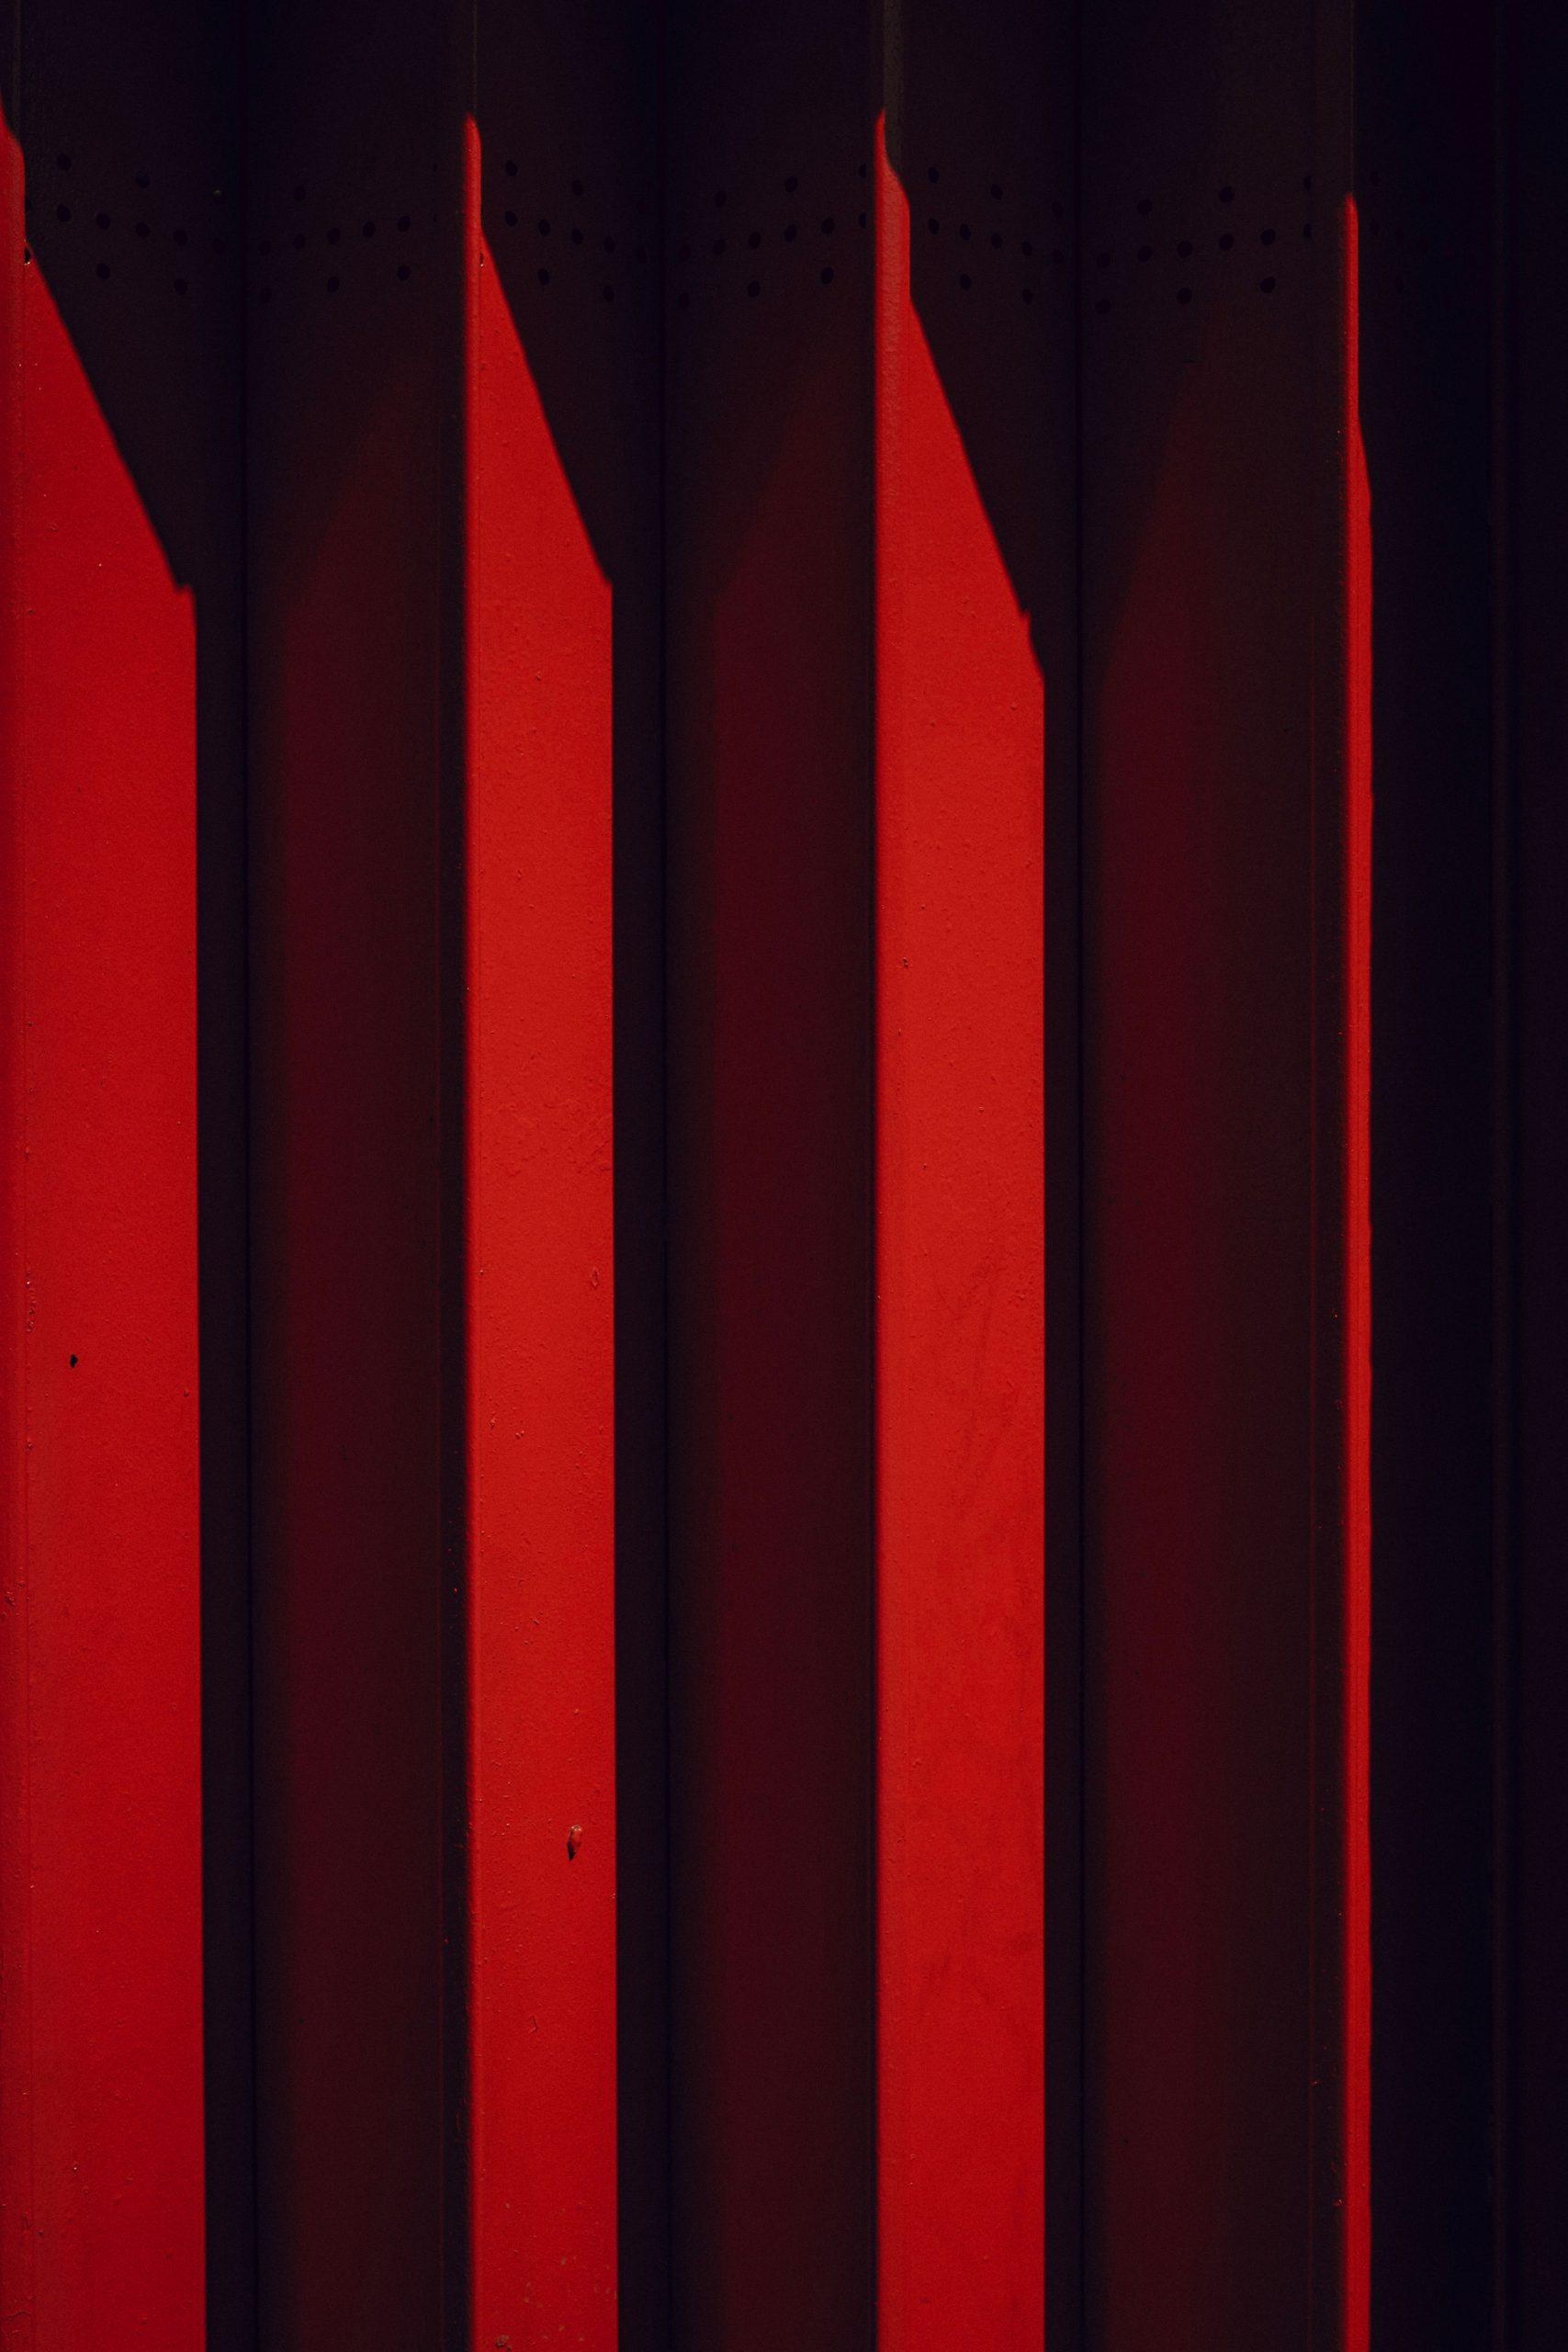 Red Wallpaper for status